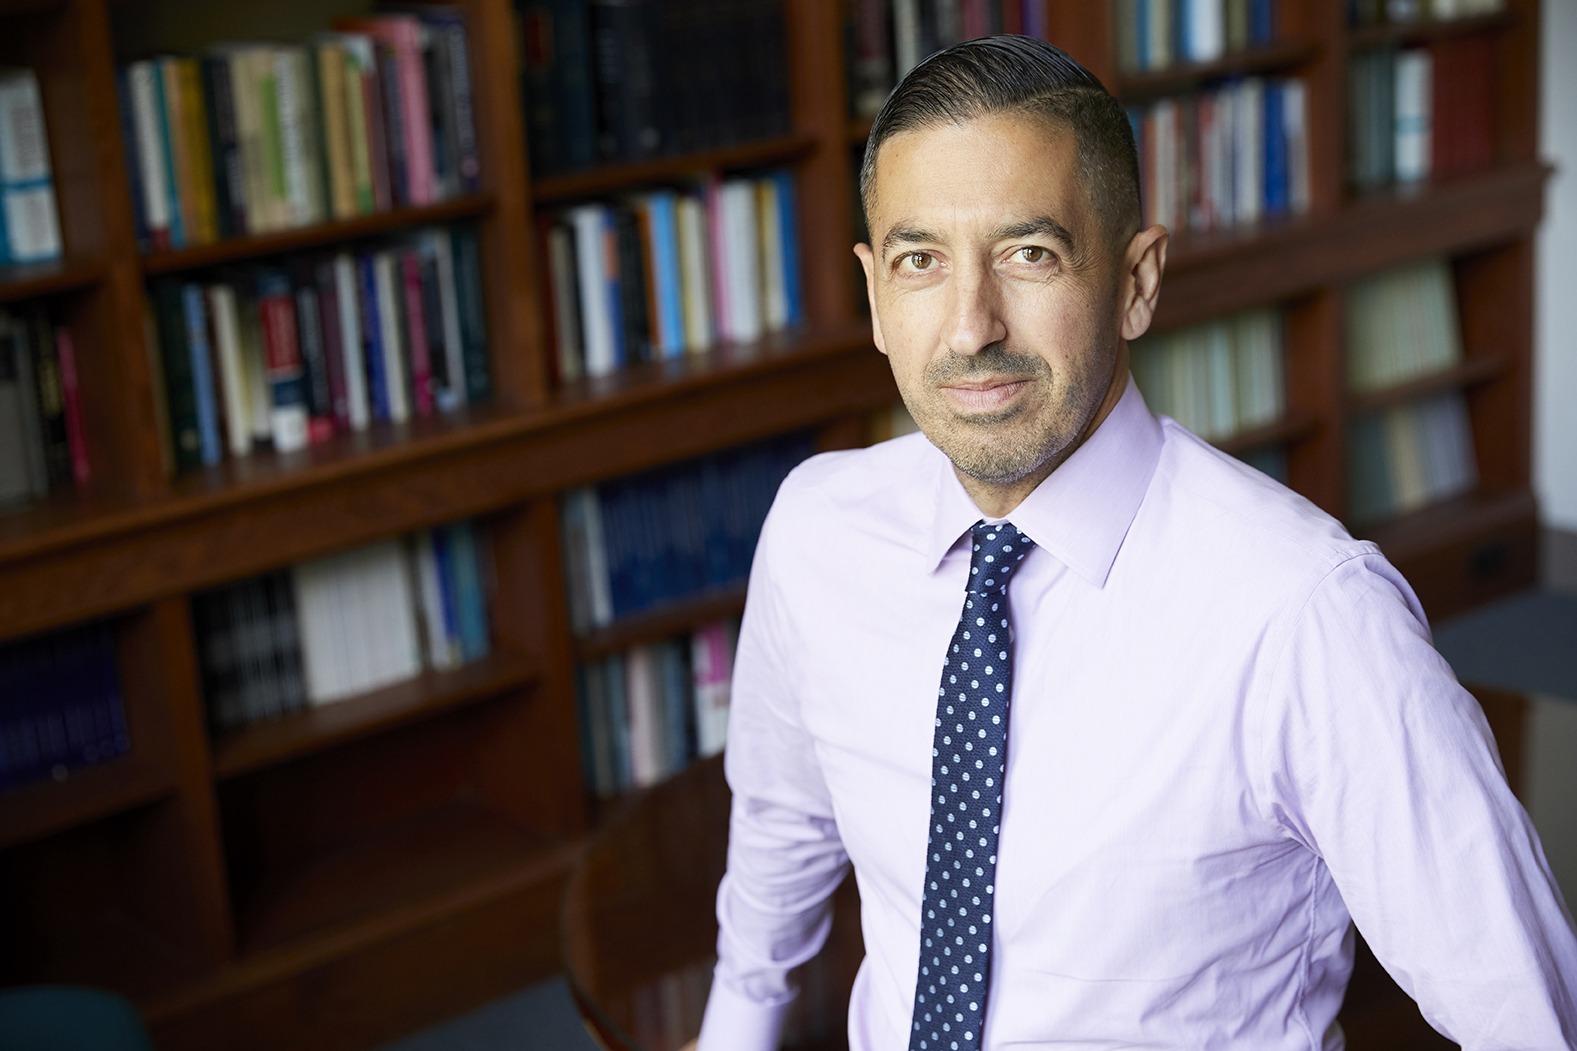 Sandro Galea